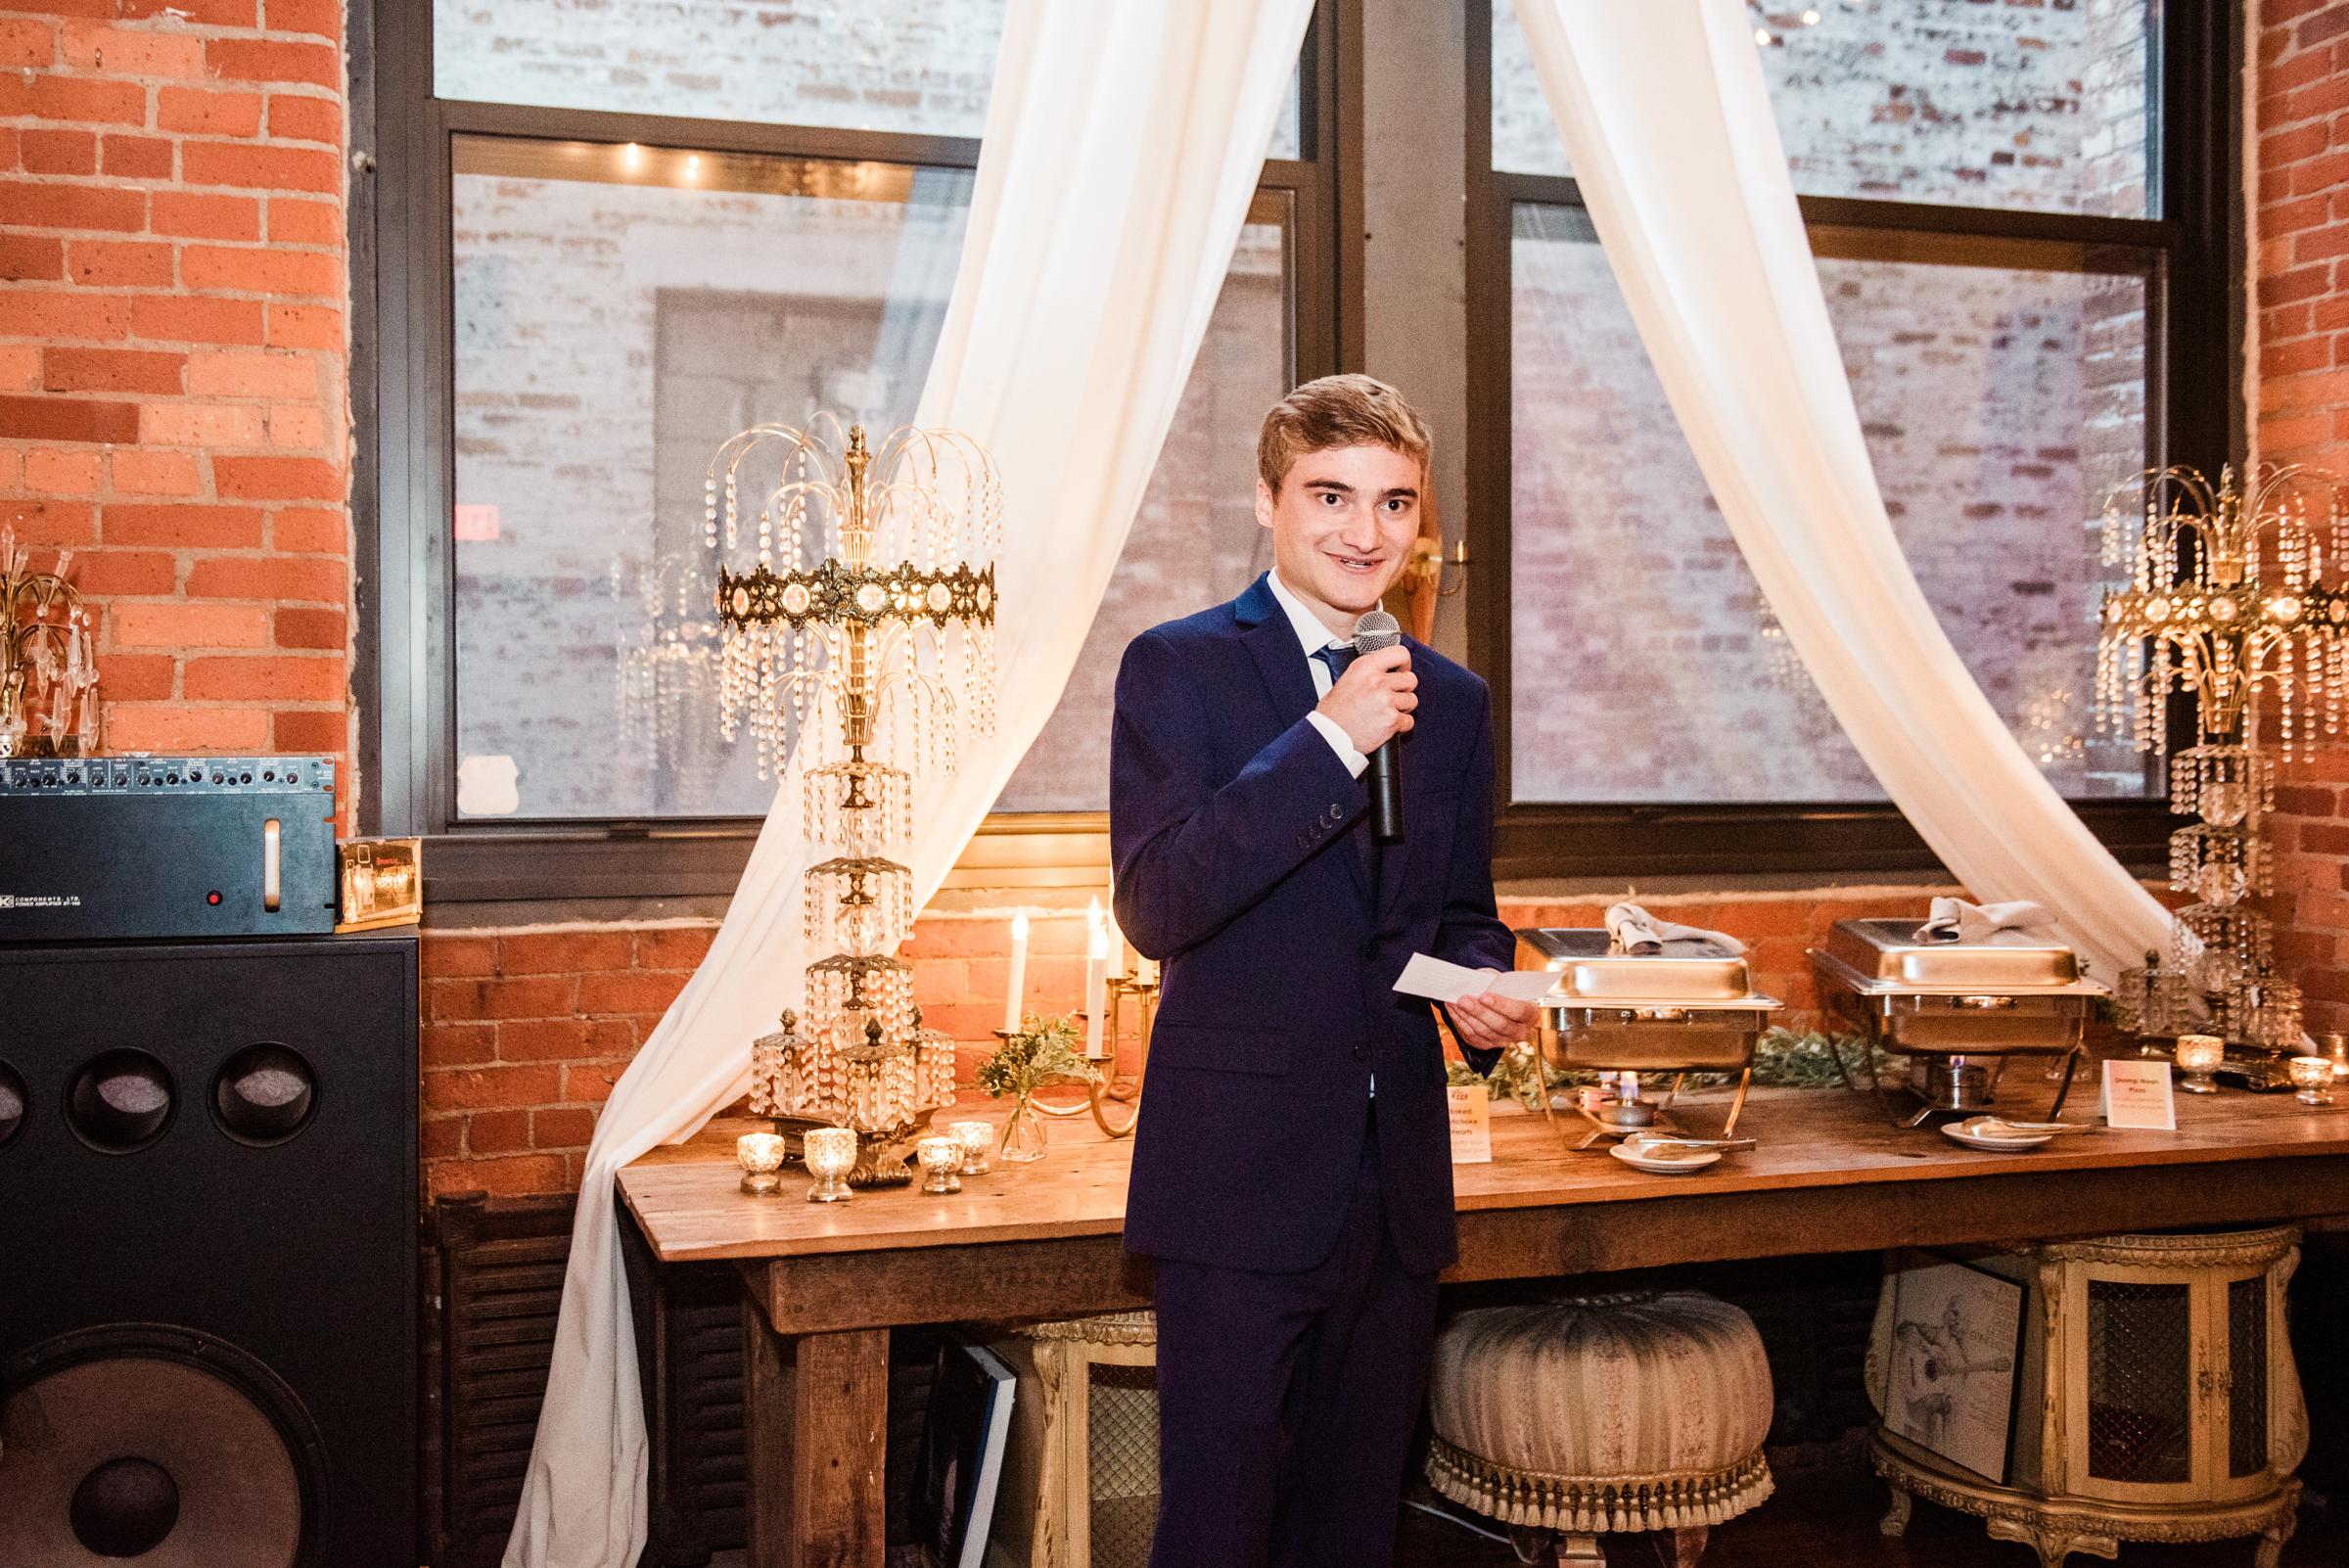 Studio_180_Lamberton_Conservatory_Rochester_Wedding_JILL_STUDIO_Rochester_NY_Photographer_DSC_9240.jpg